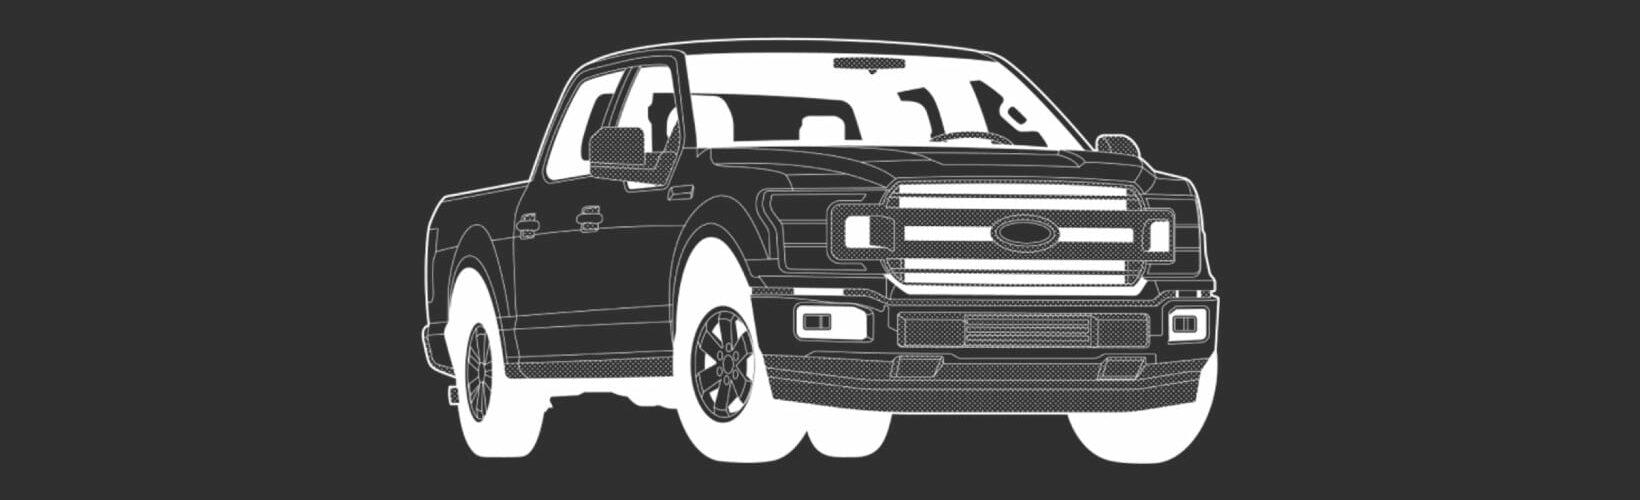 ford f150 truck